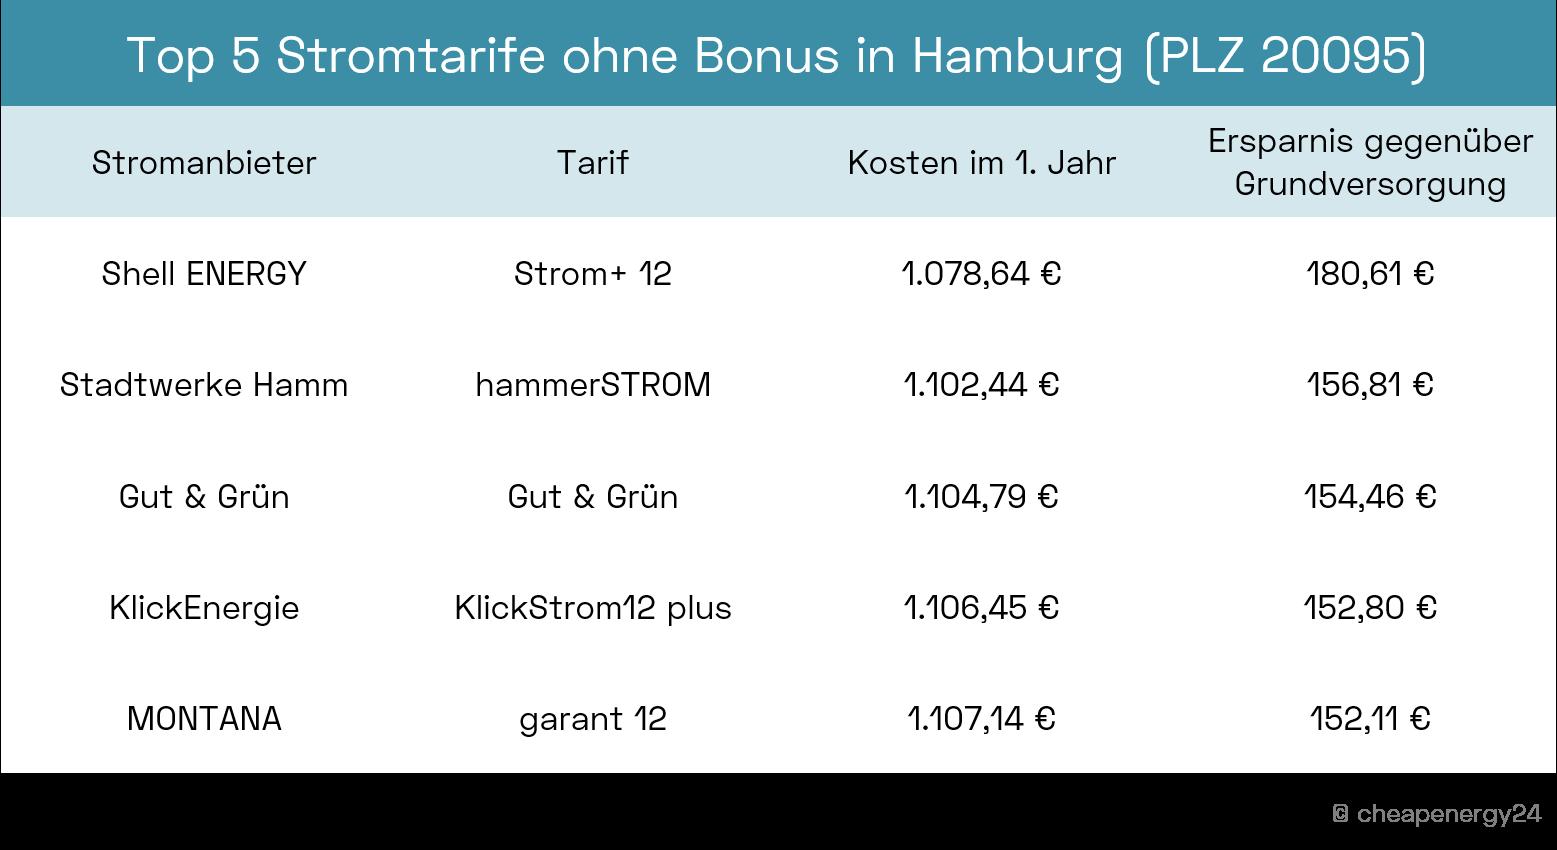 Top 5 Stromtarife ohne Bonus in Hamburg